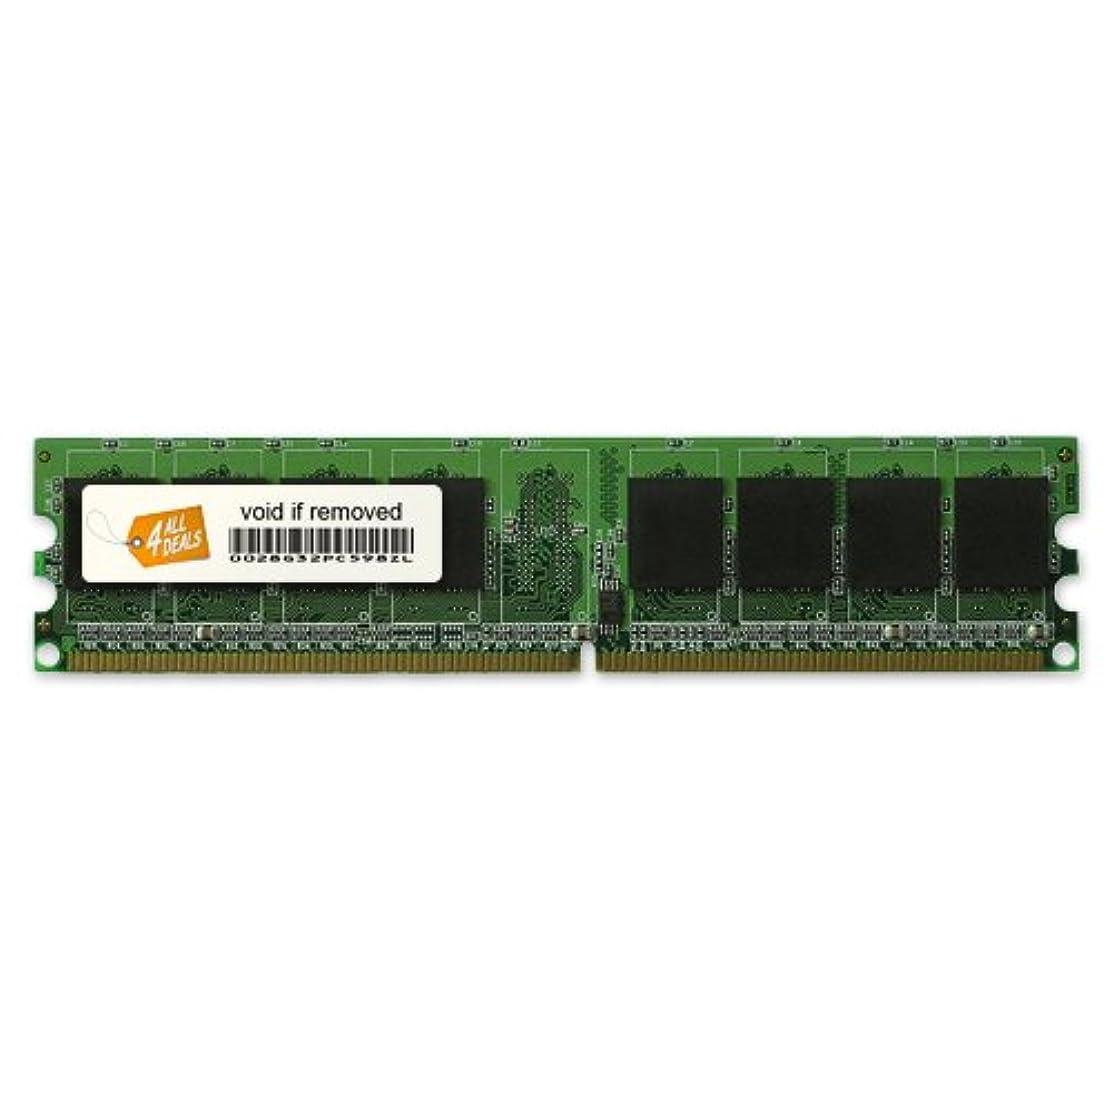 2GB DDR2-533 (PC2-4200) Memory RAM Upgrade for the Dell Optiplex GX Series GX620 Desktop